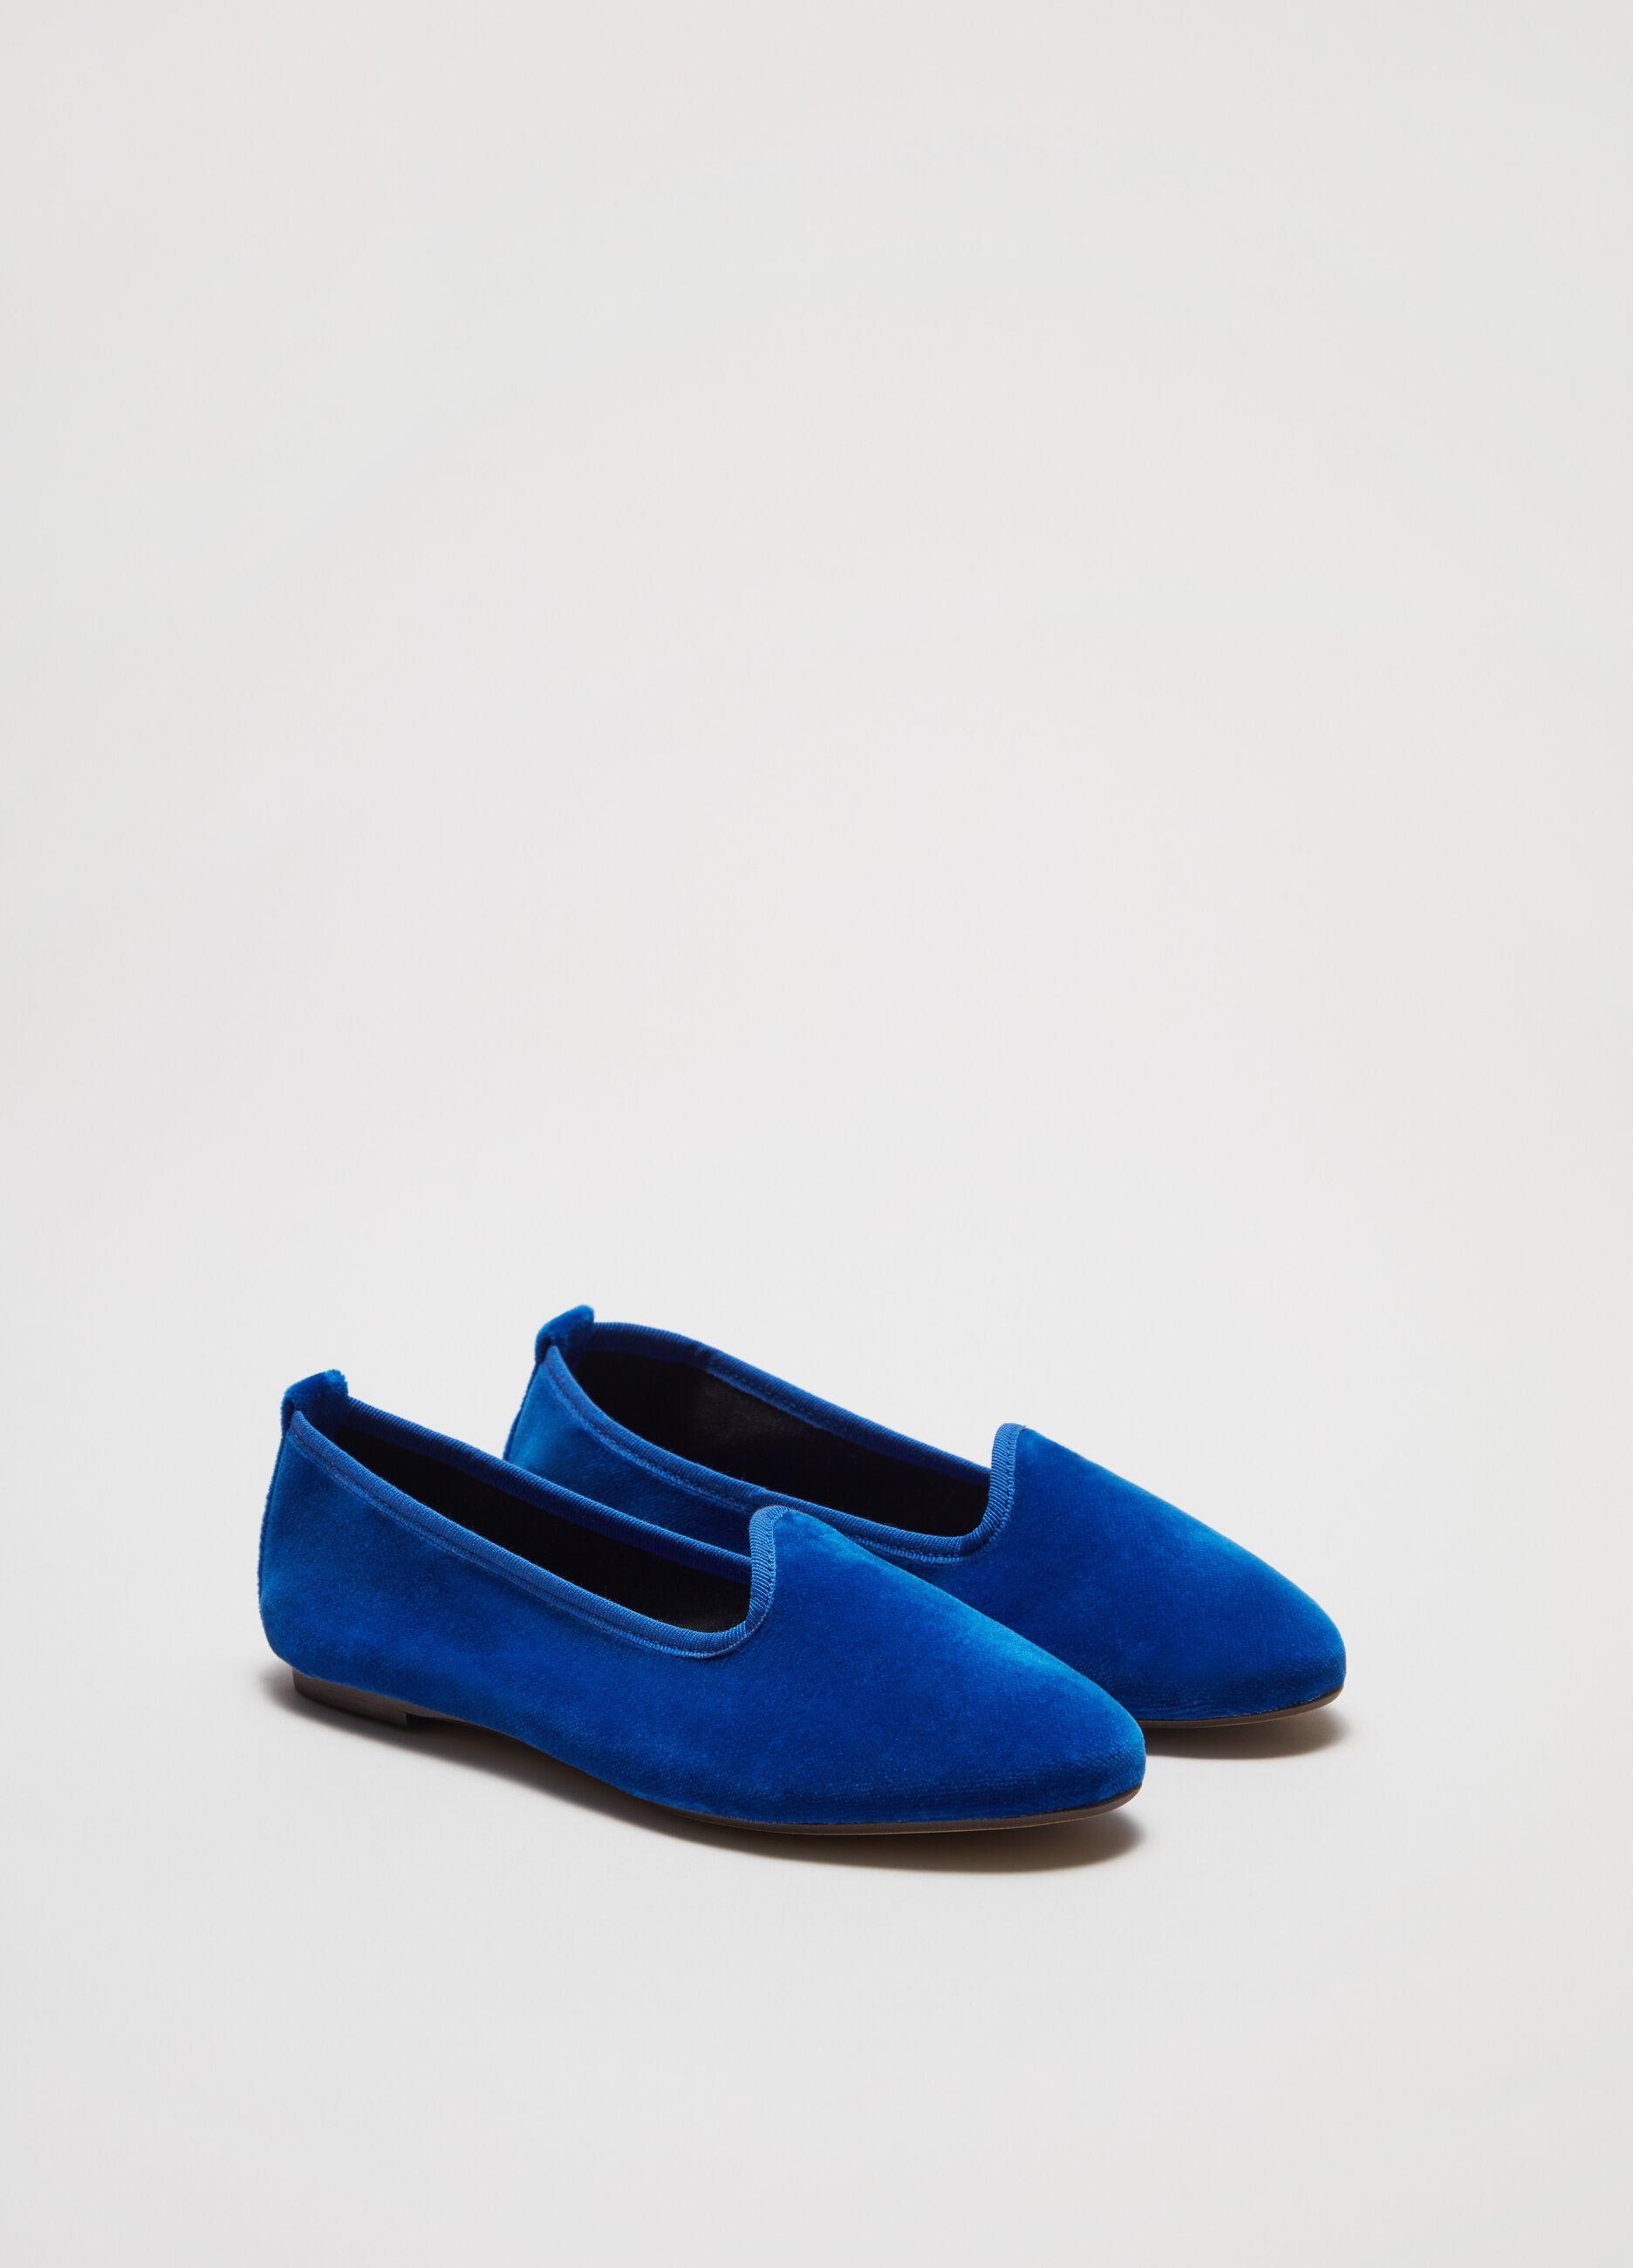 Scarpa friulana Blu